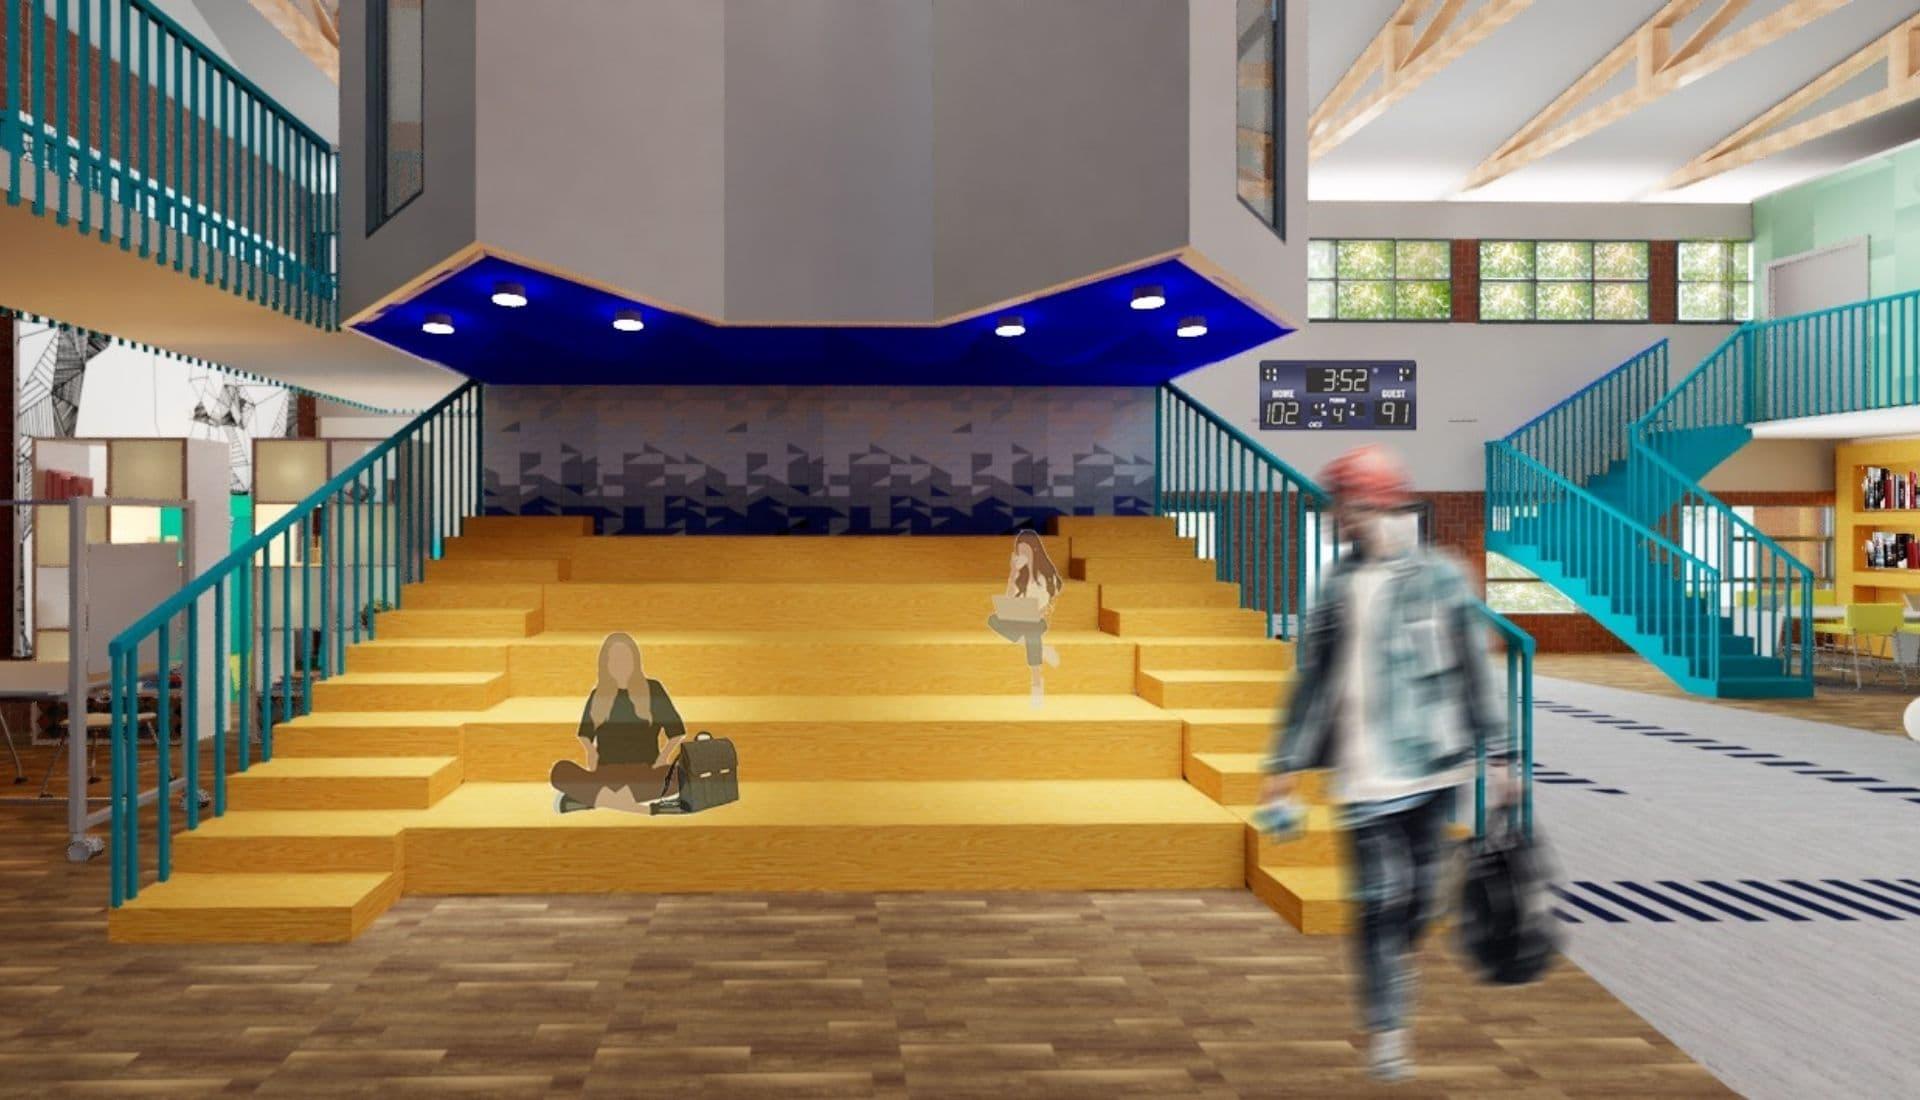 murrumbidgee high school amphitheater seating